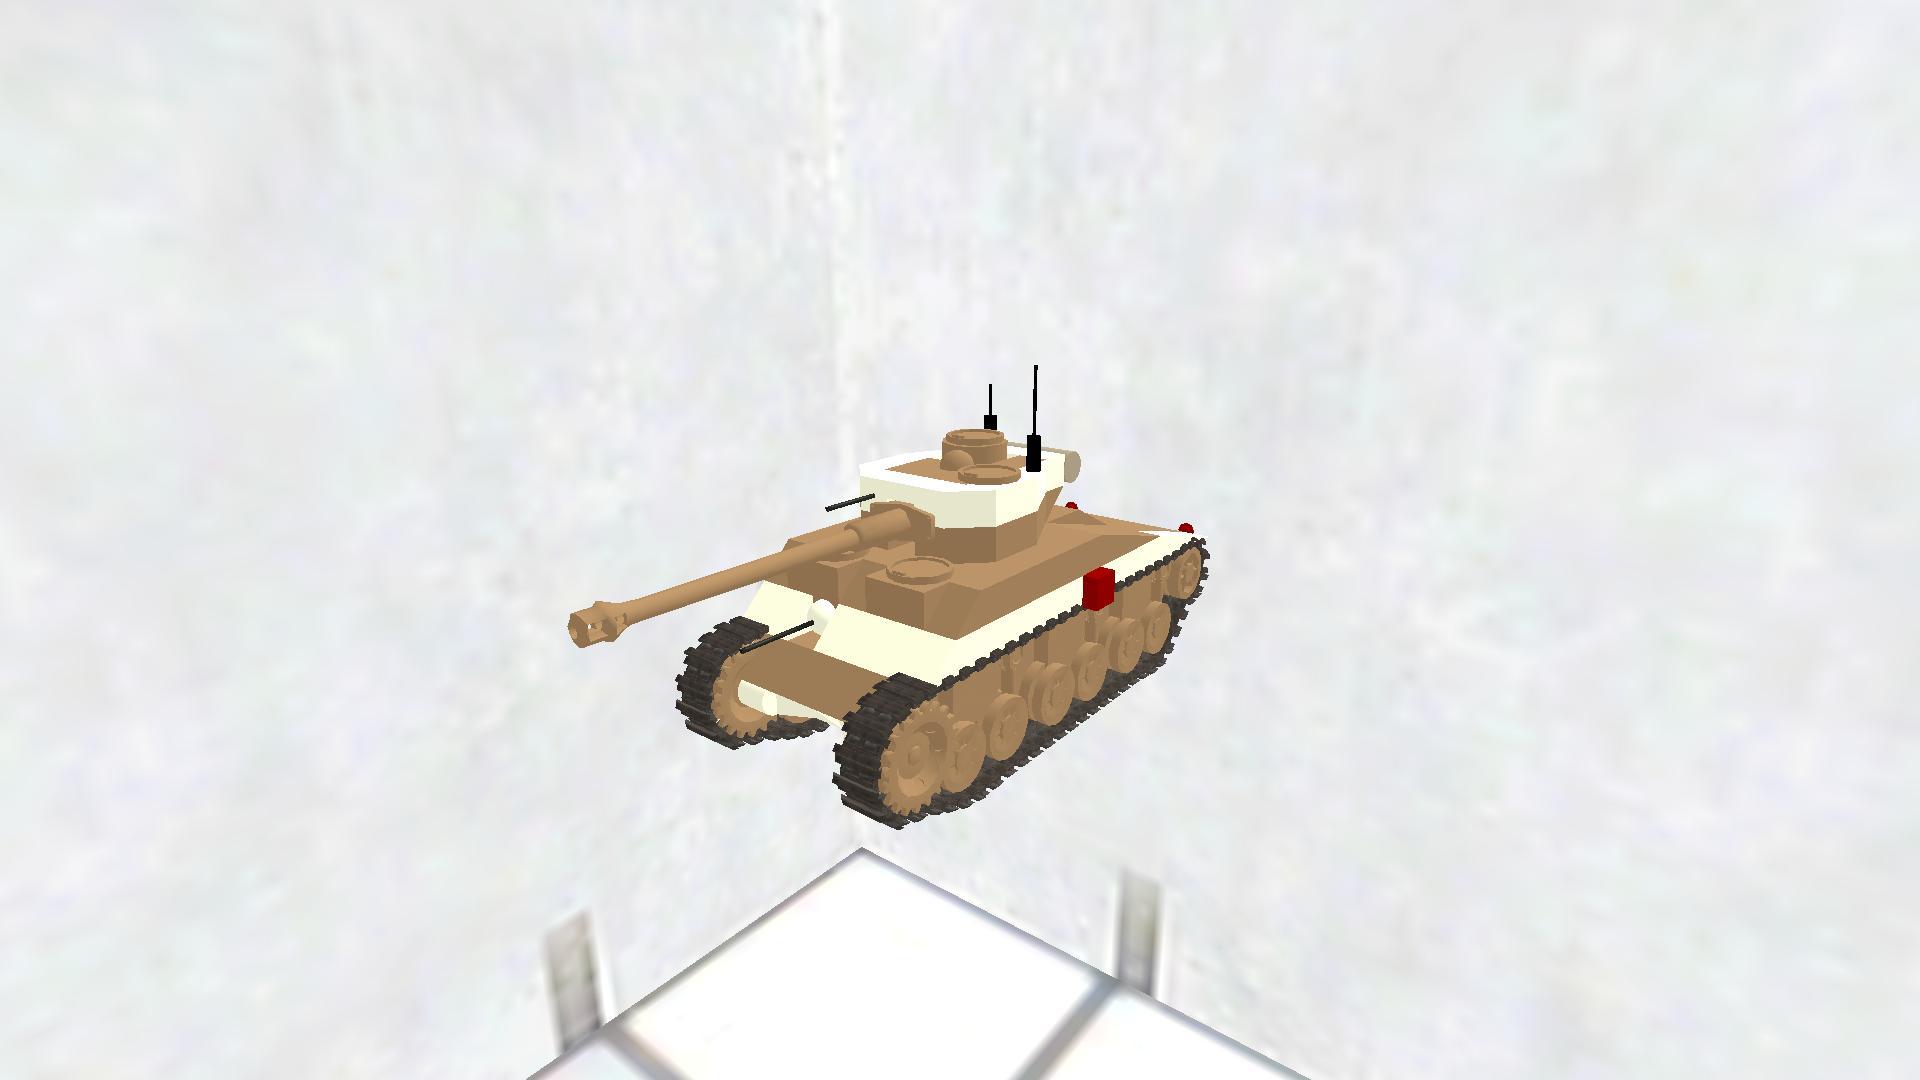 M4serman